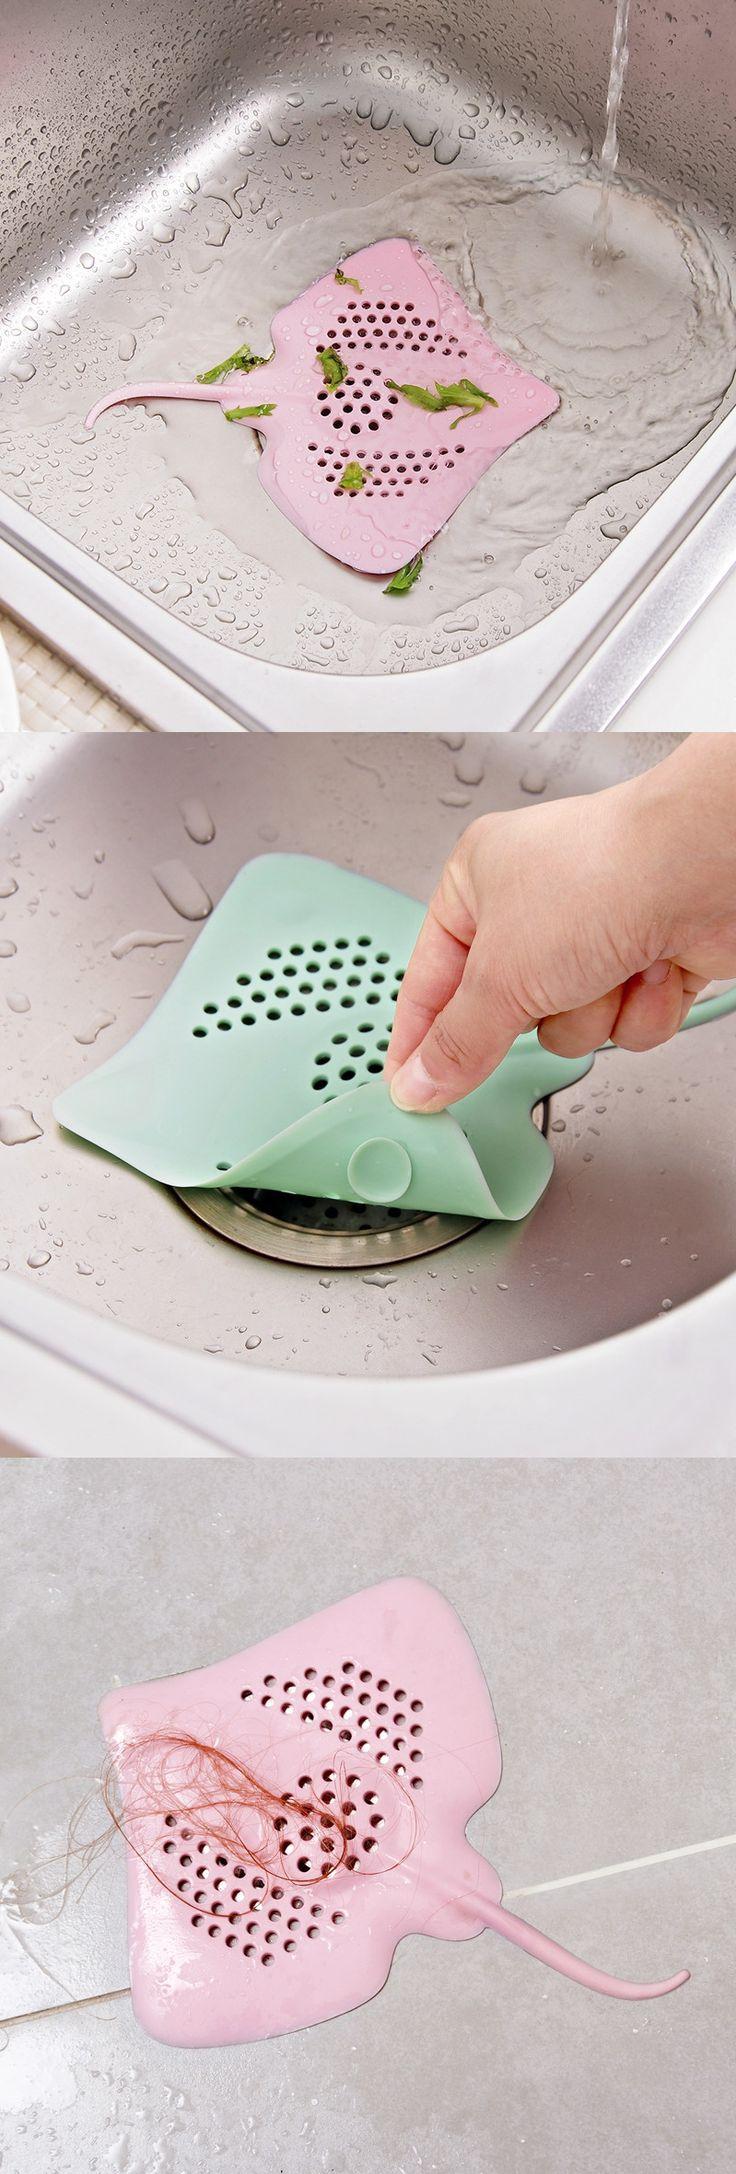 US$3.65 Plastic Kitchen Bathroom Sink Filter Drain Cover Hairs Food Waste Strainer Stopper Sink Bathtub Prot